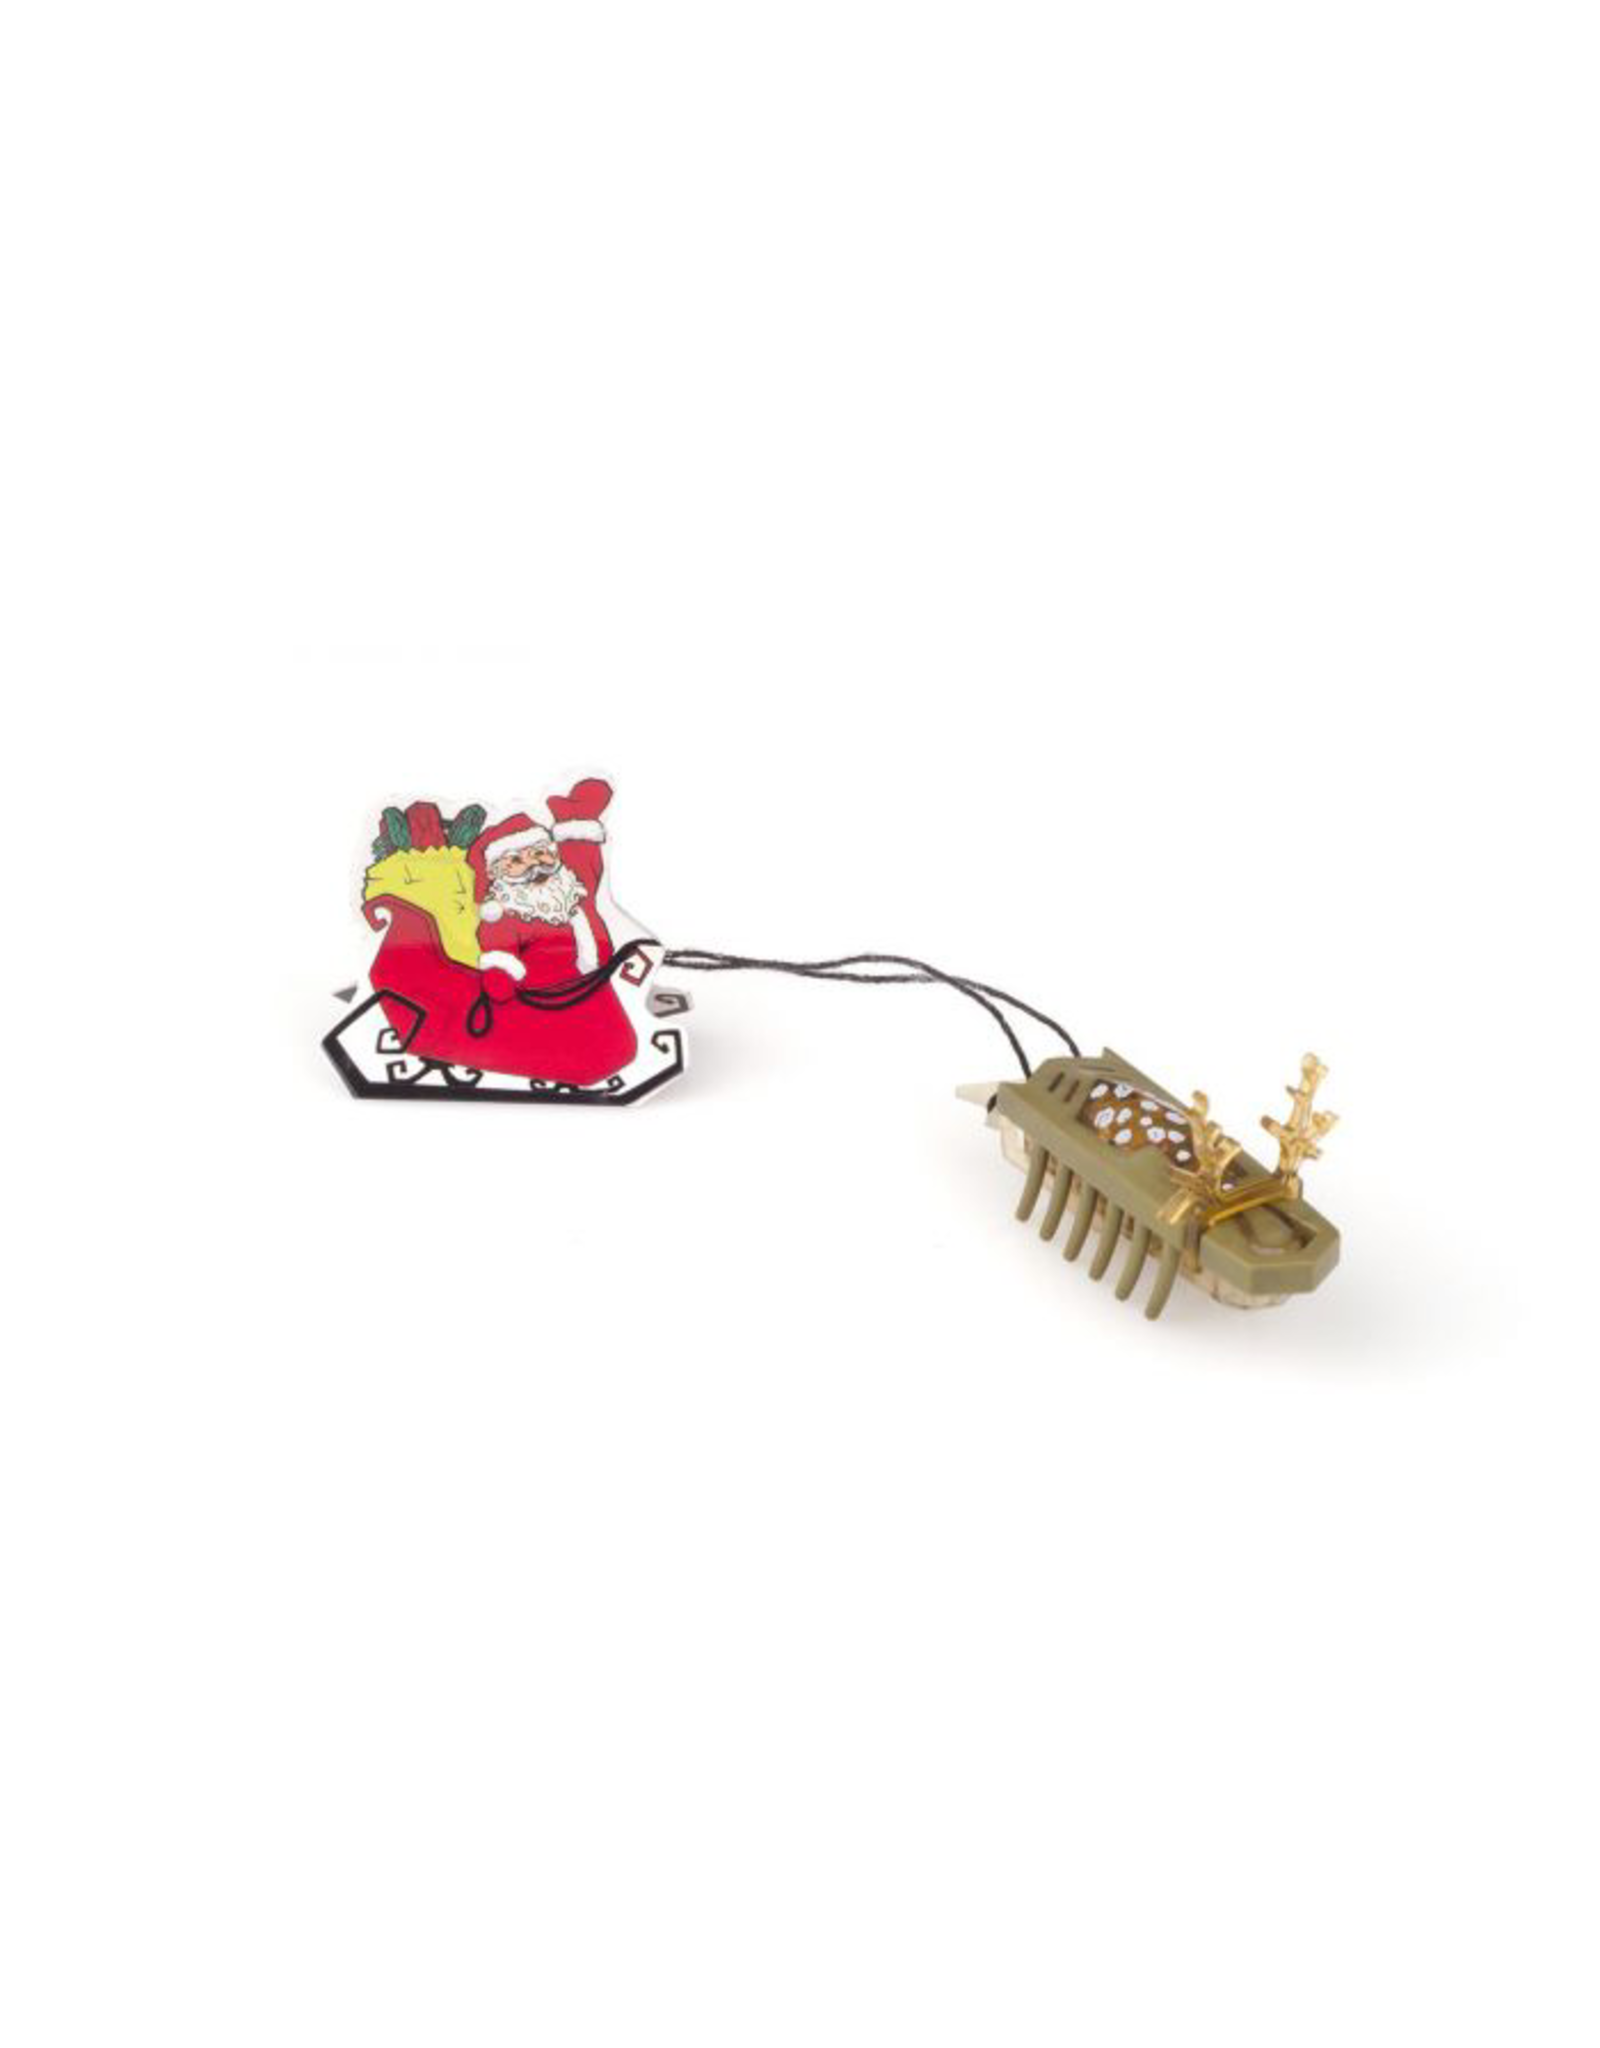 Hexbug HEXBUG Nano Reindeer pulling Santa in Sleigh